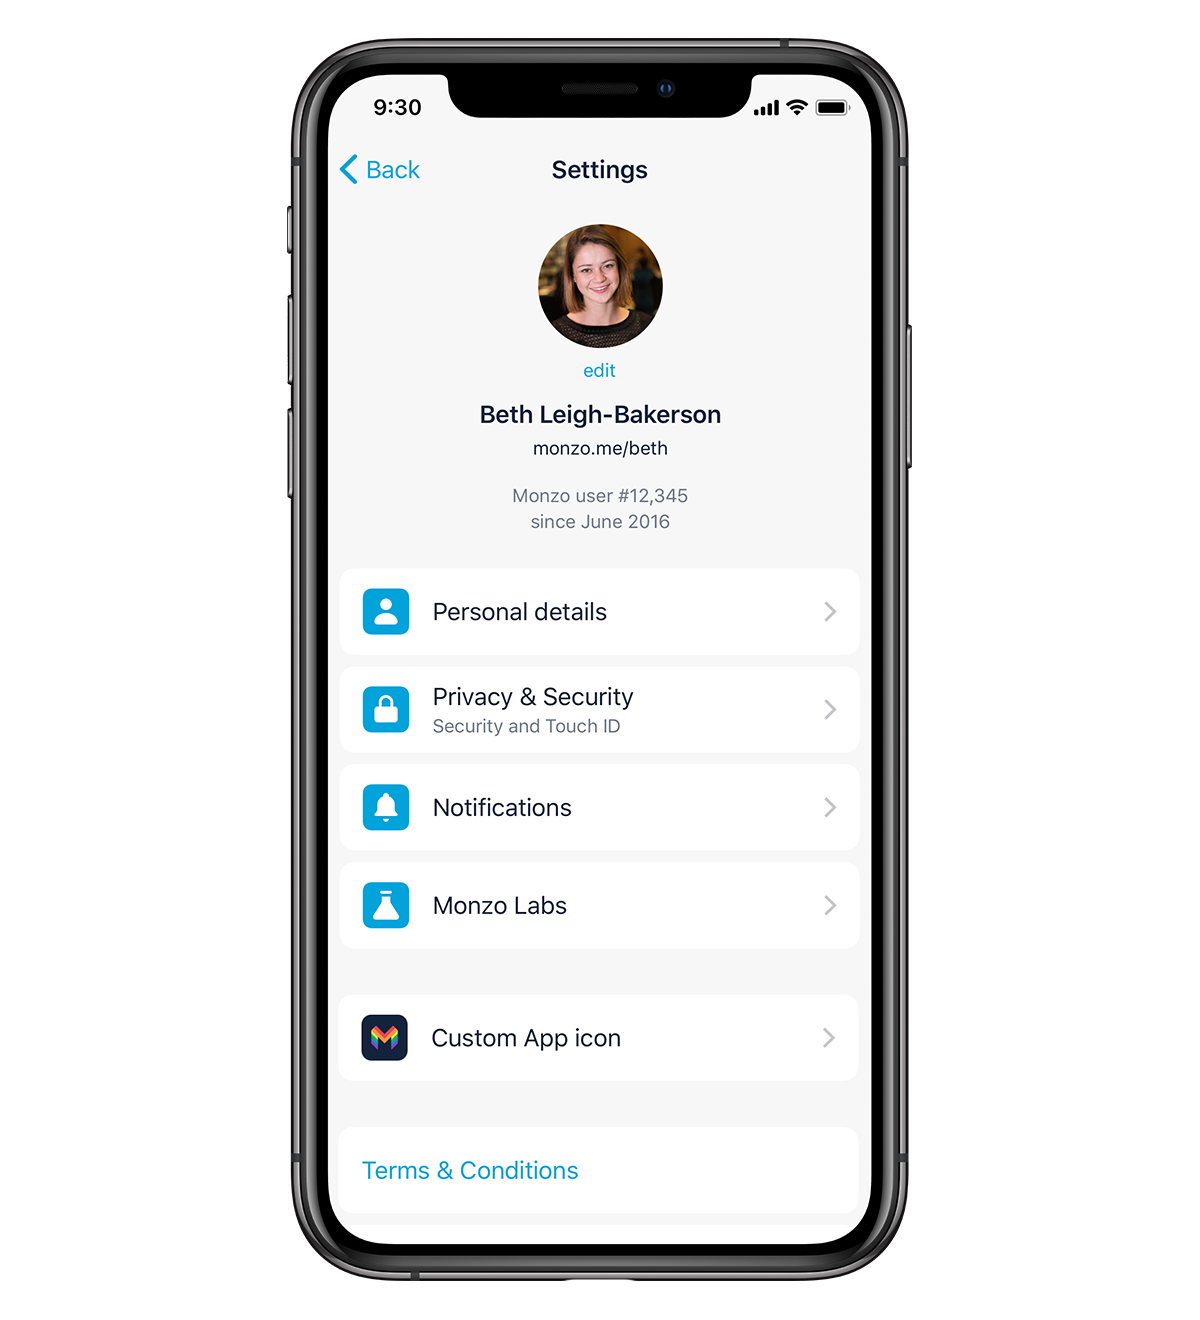 Sneak peek of tidier settings screen